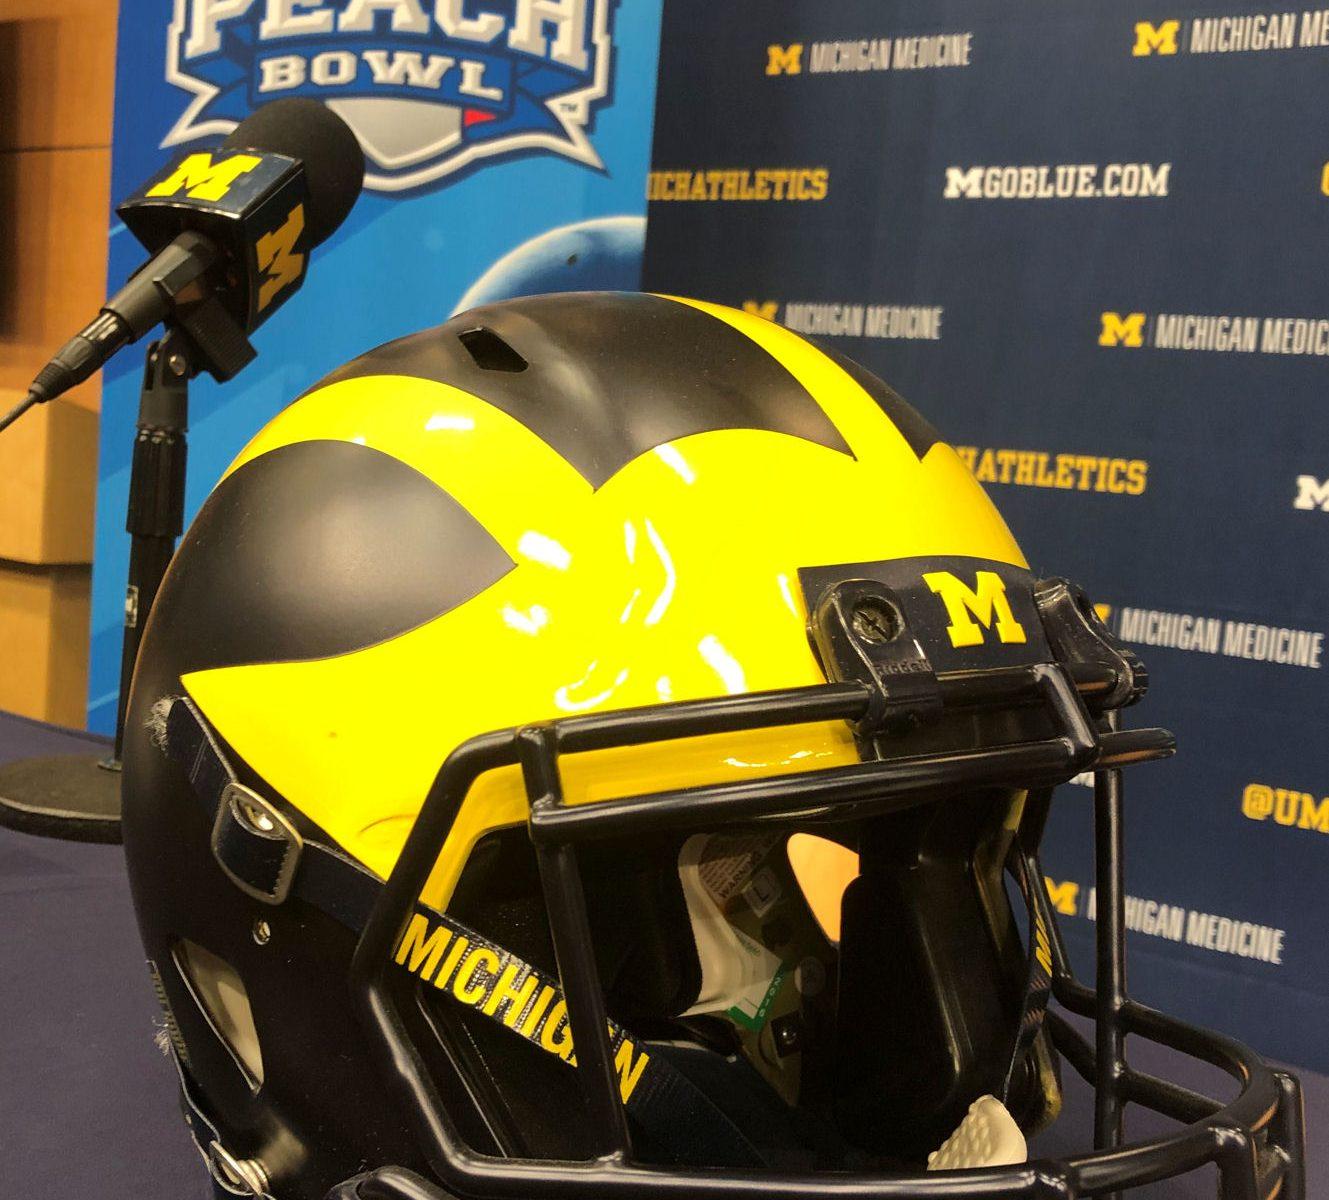 SP+ Archives - UMGOBLUE COM Michigan Wolverine Football